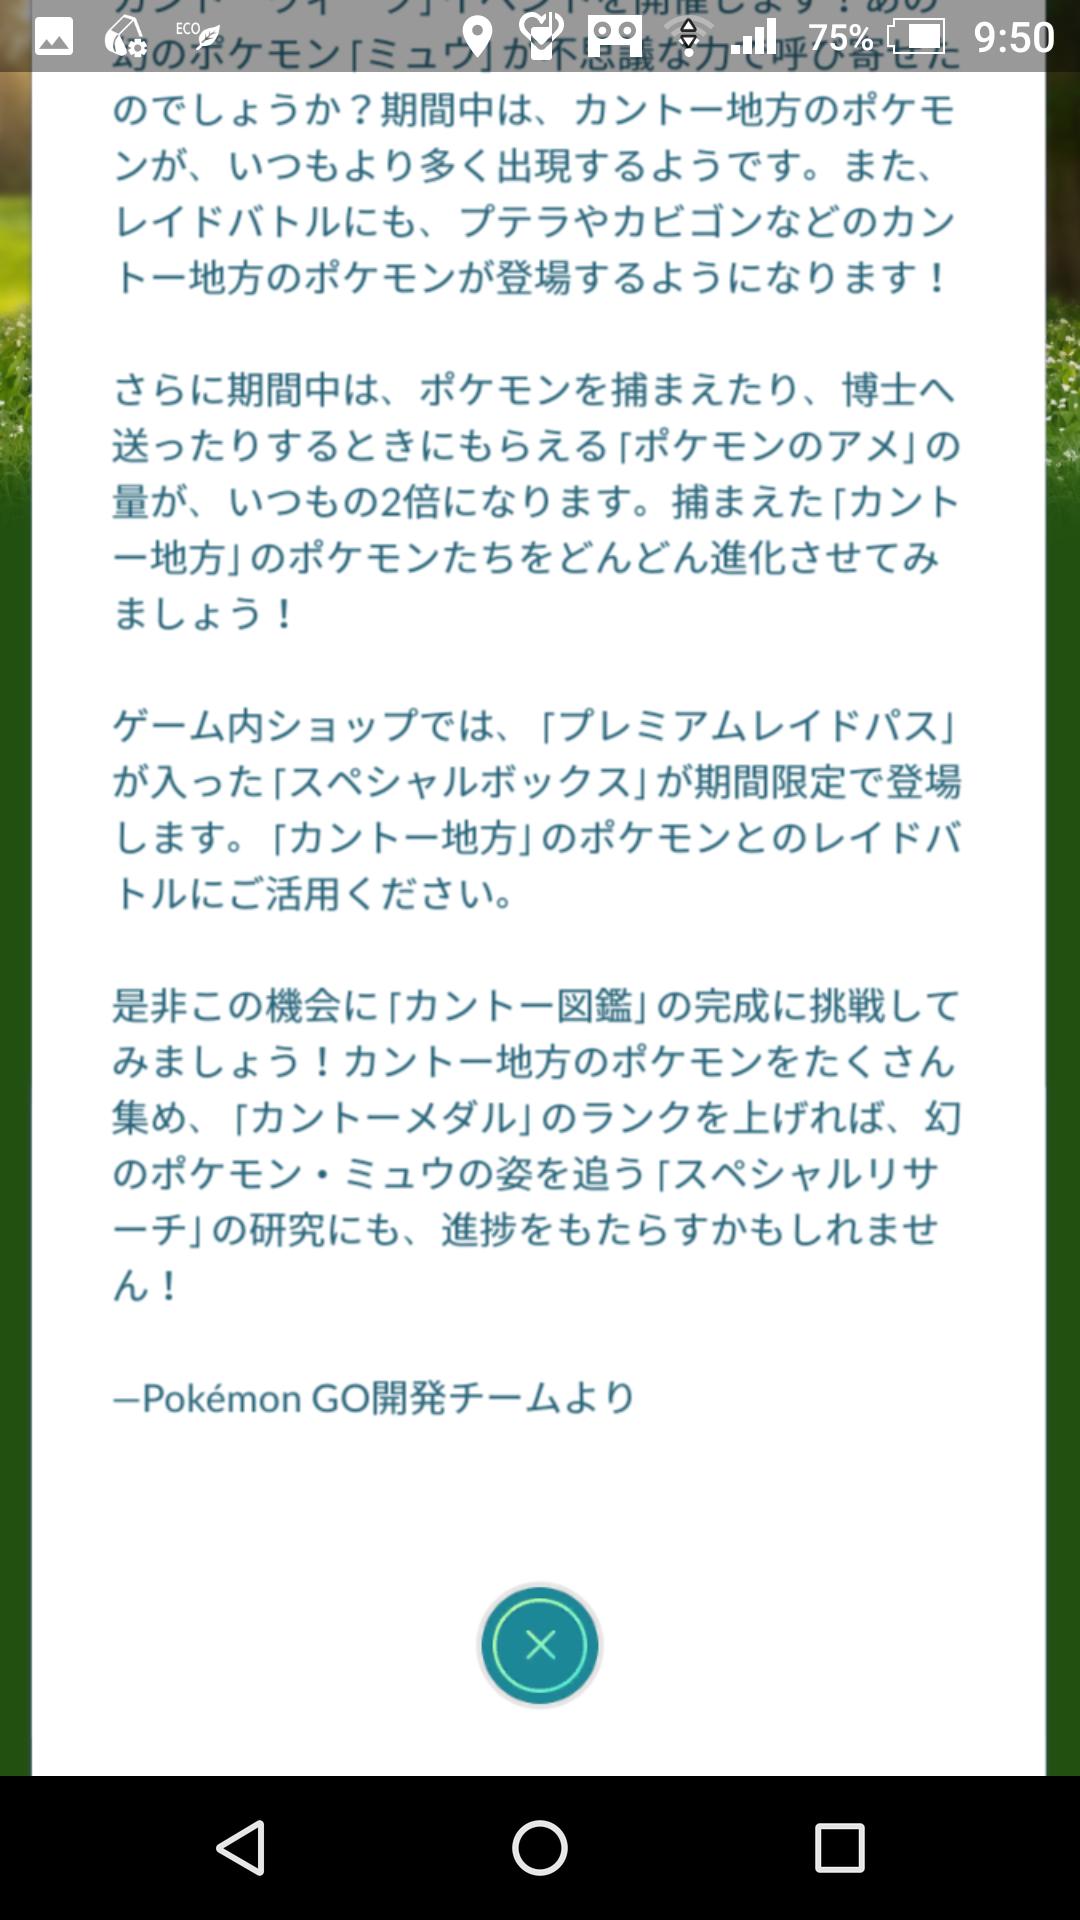 Screenshot_20180412-095007.png